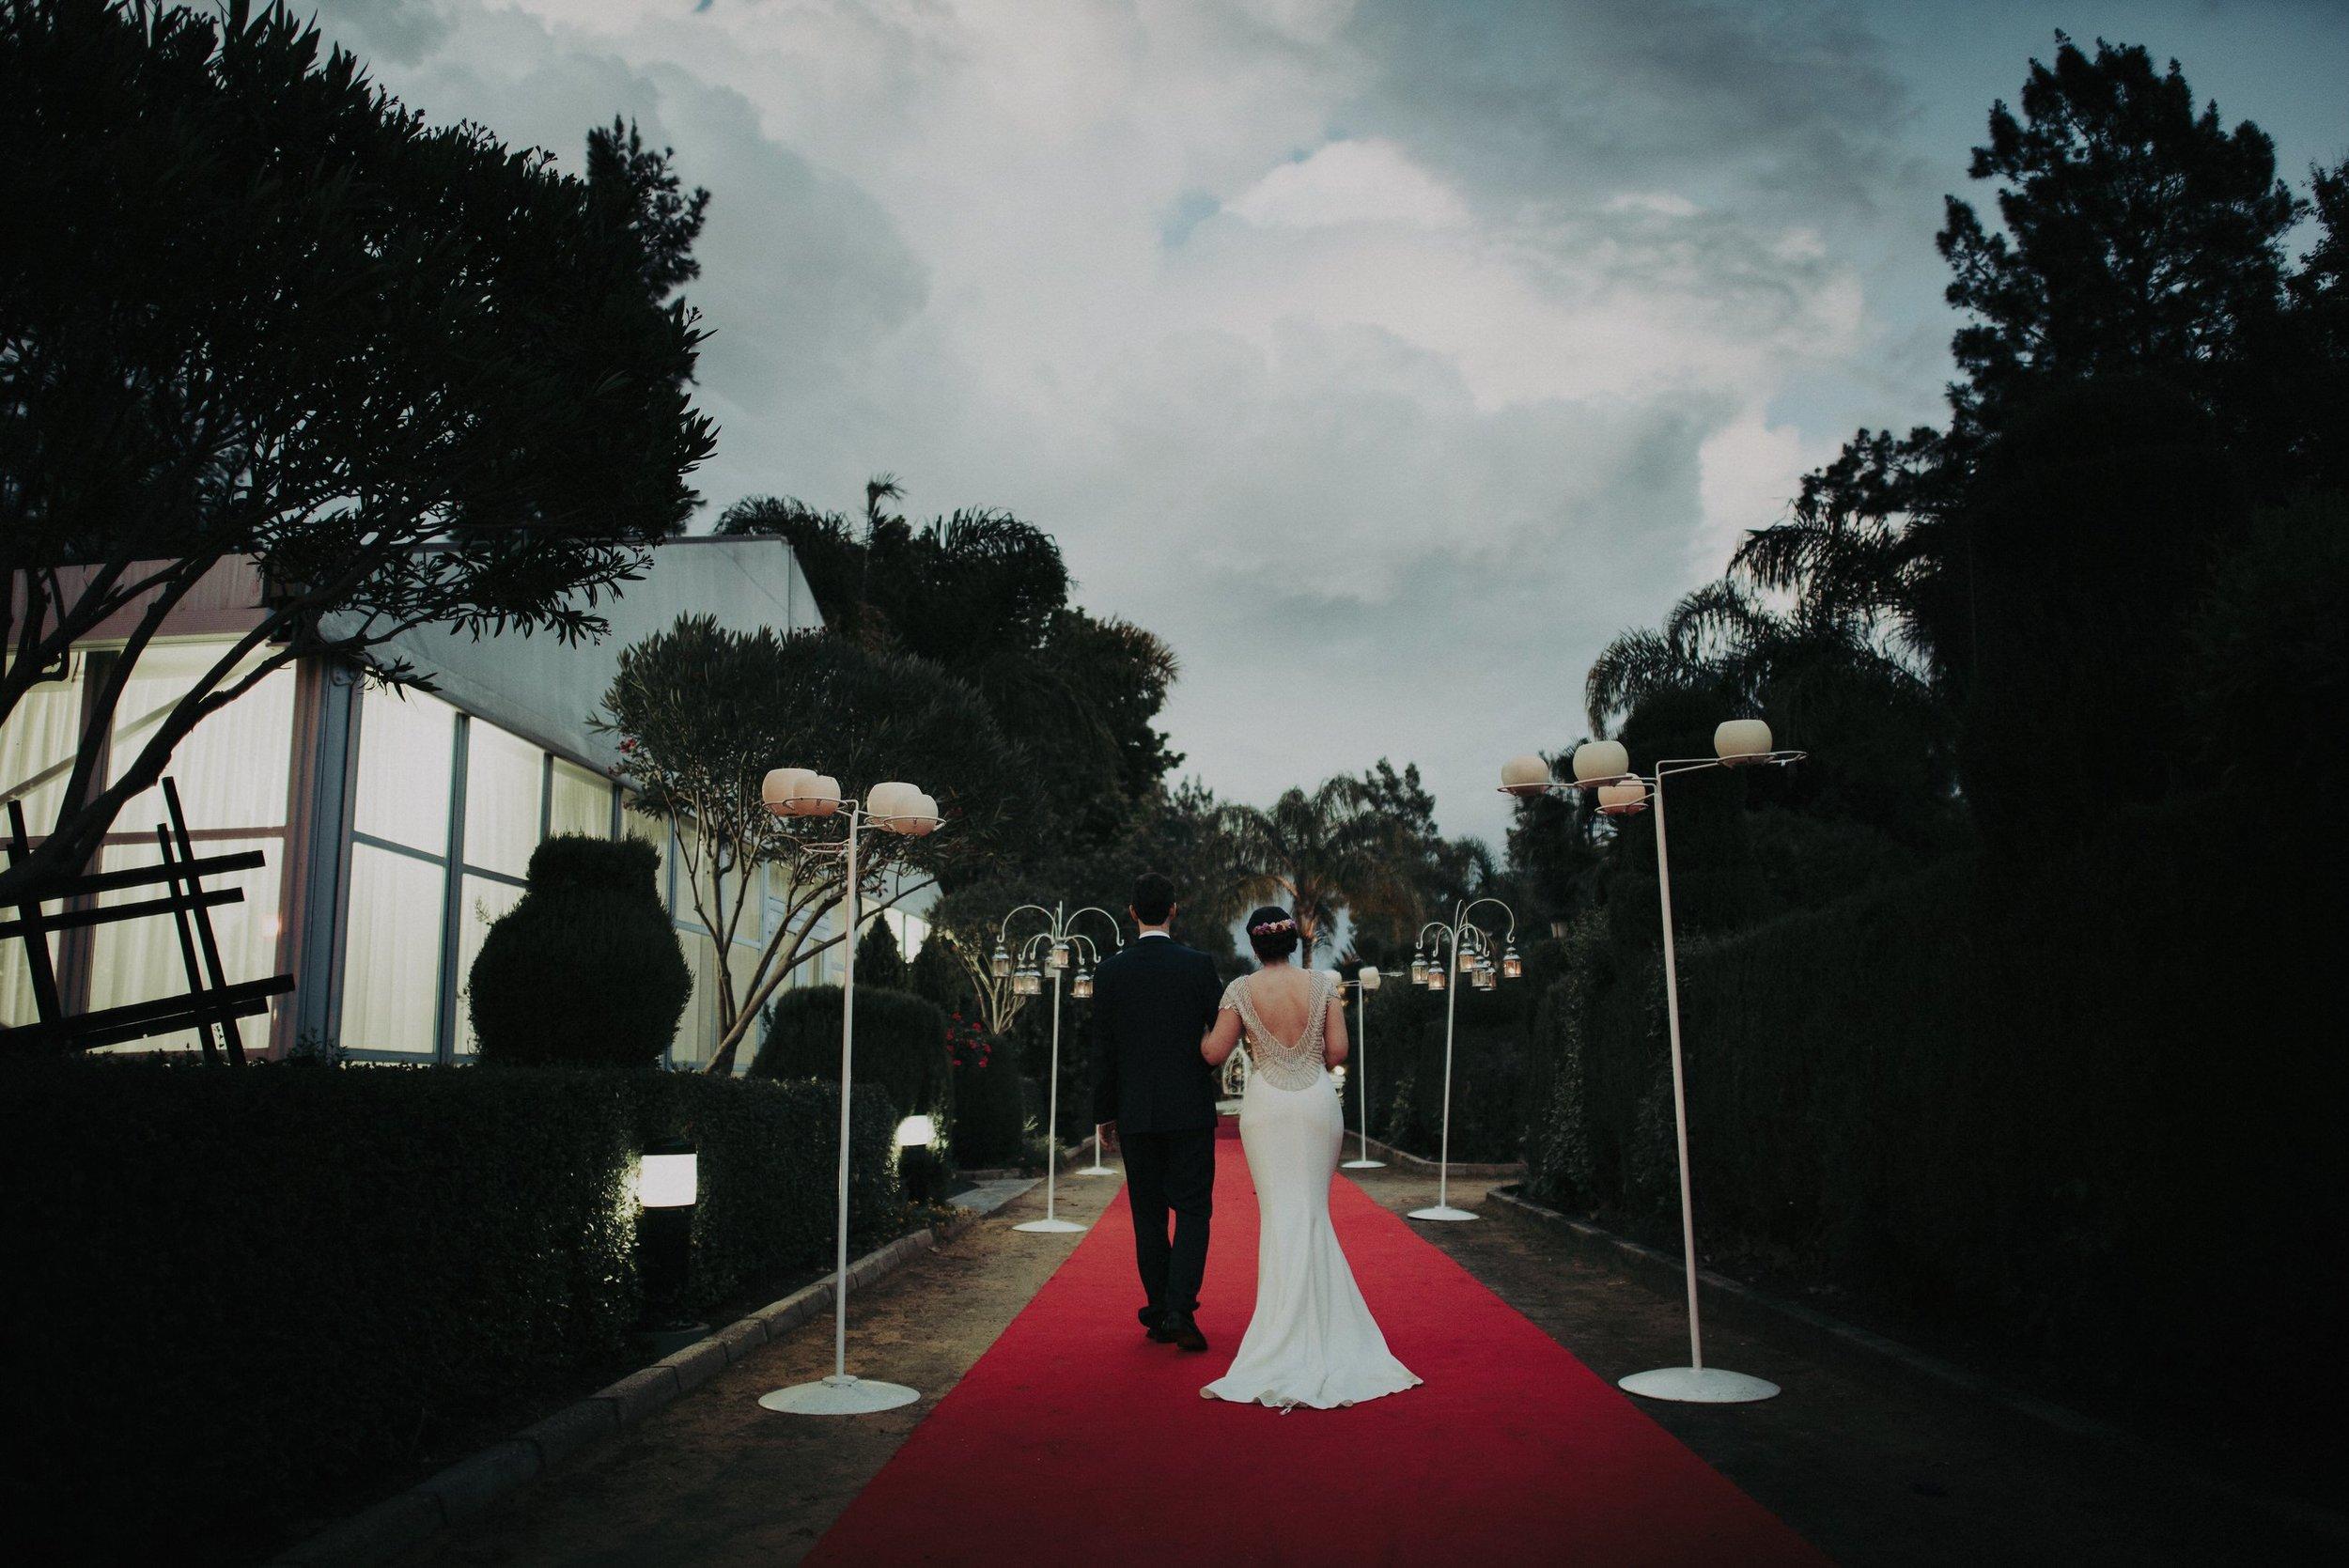 Laura & Rubén - boda en utrera - Santa clotilde- Manolo mayo - Fotografo de boda - Andrés Amarillo AAA_1075-Exposure (35).jpg